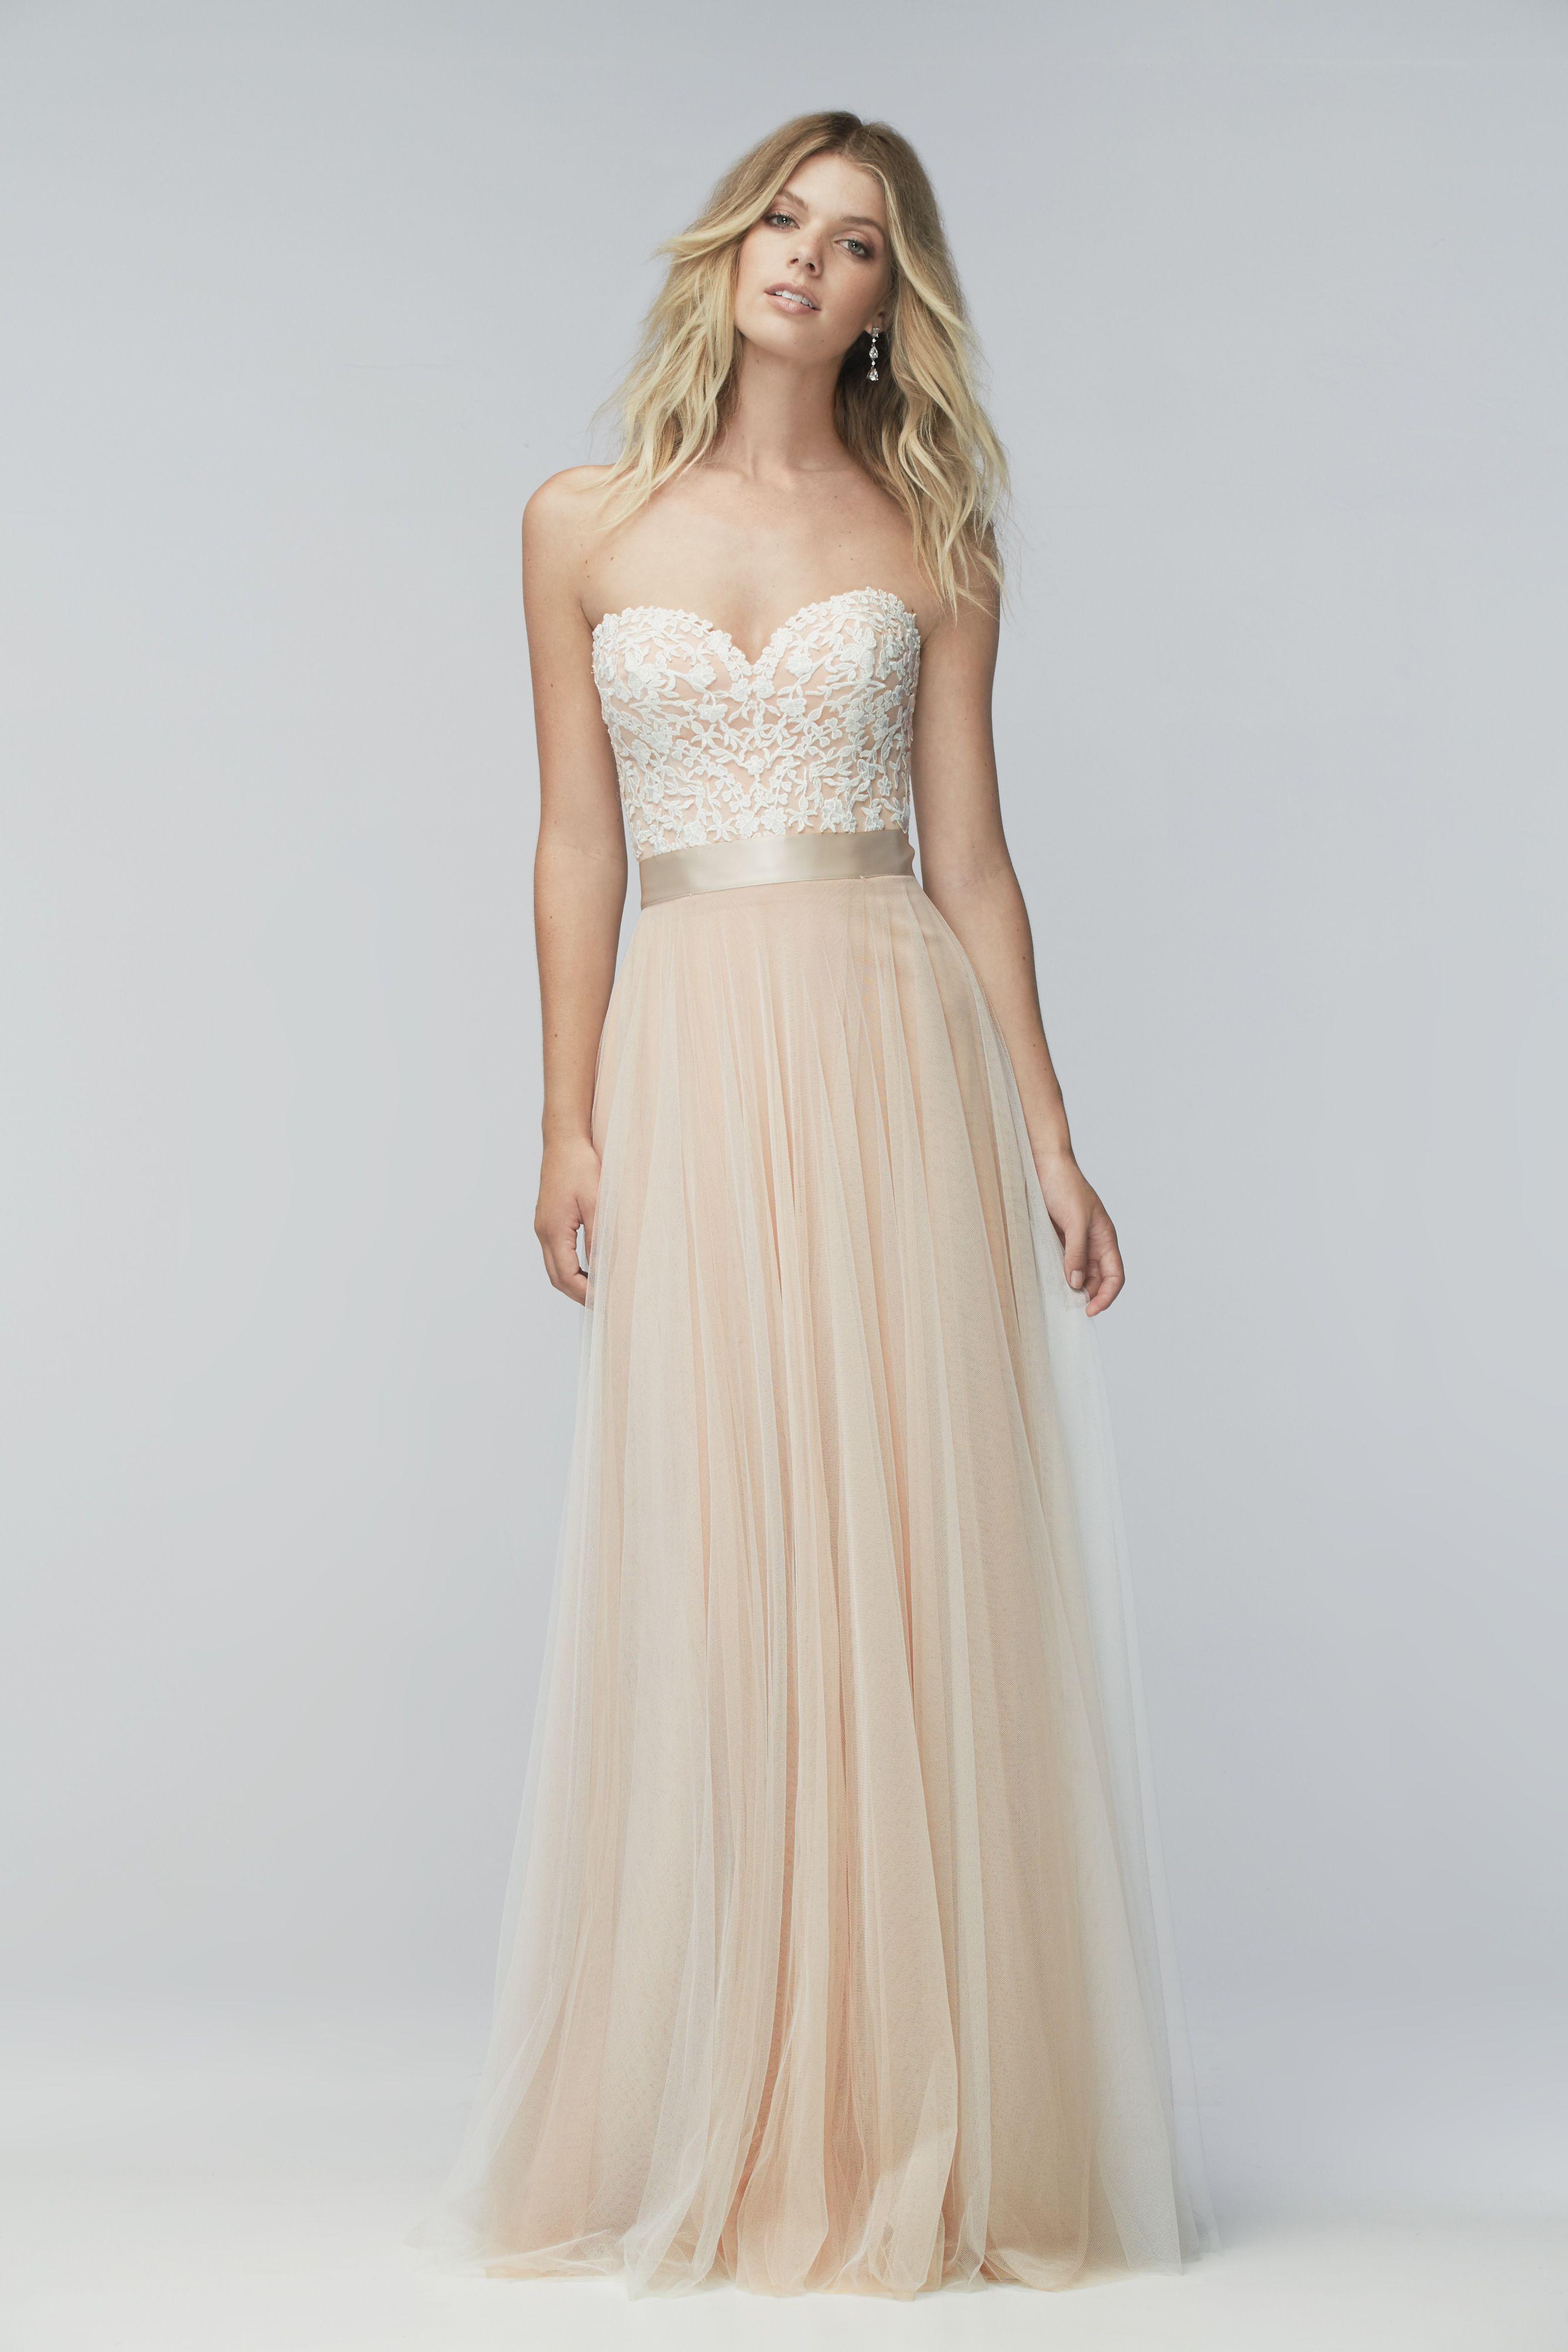 watterswtoo Catherine 16718 Wedding dresses under 500